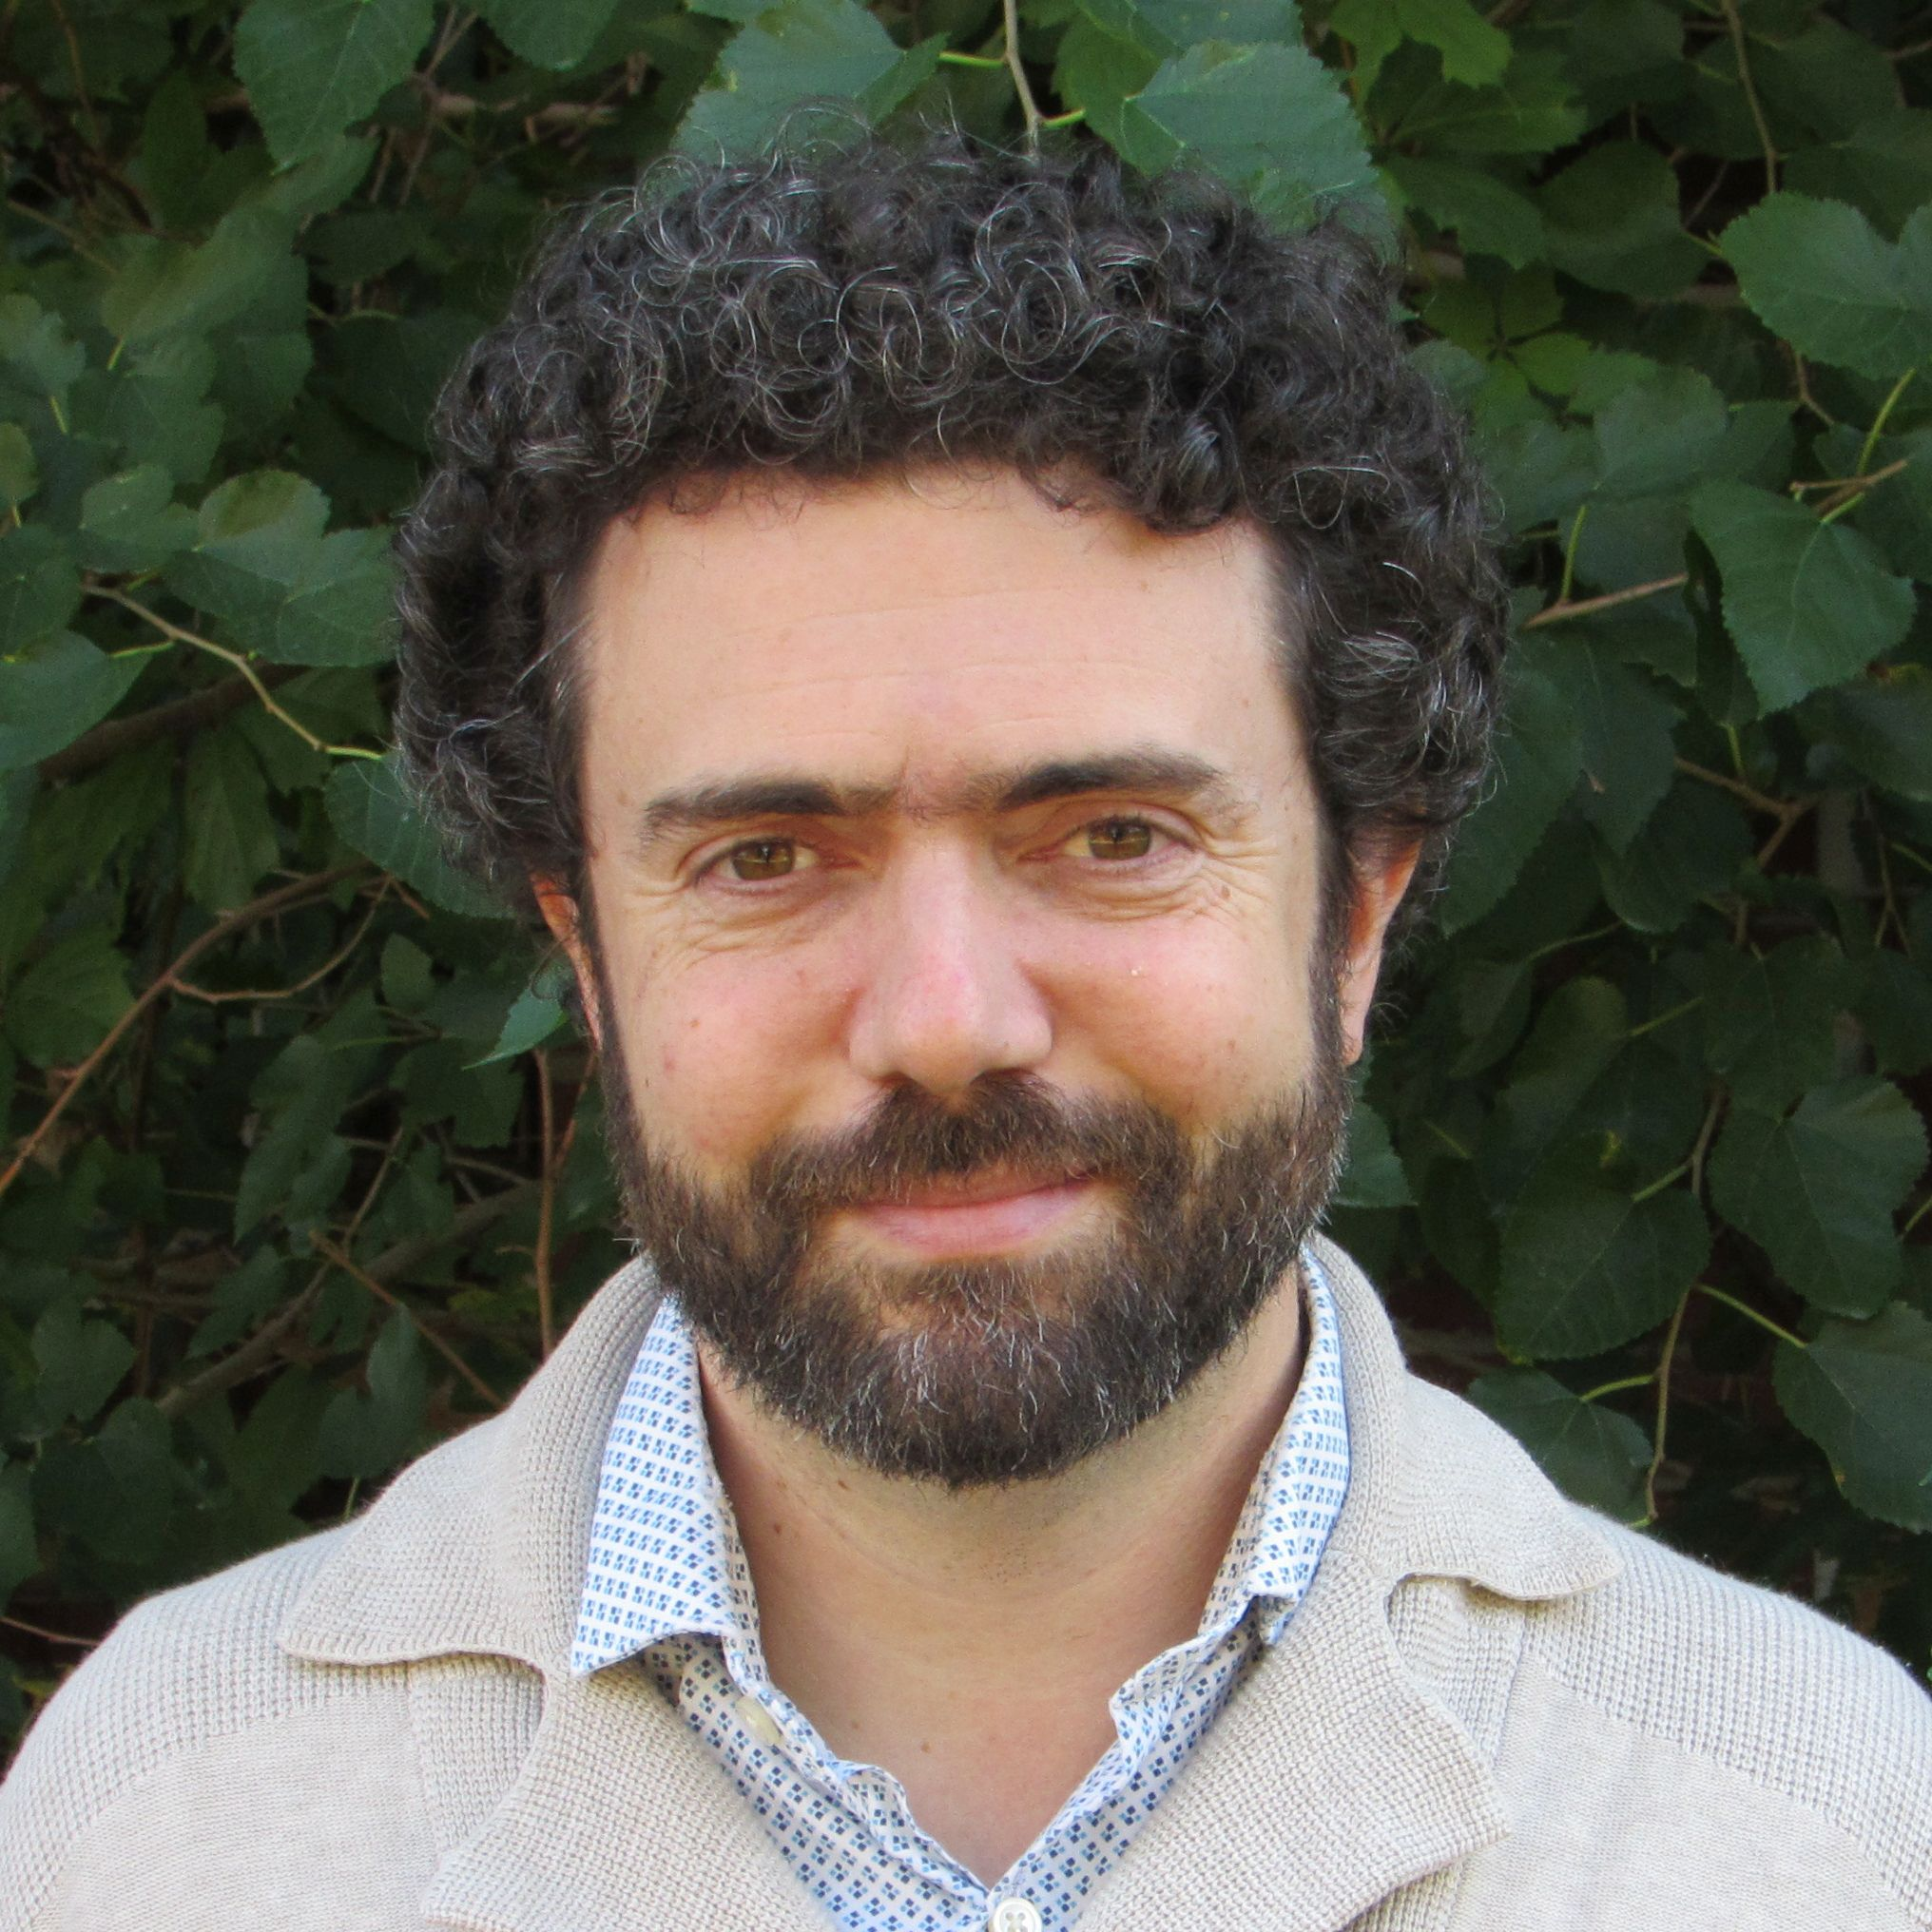 Daniel Bader, Ph.D., RP (Qualifying), CCC